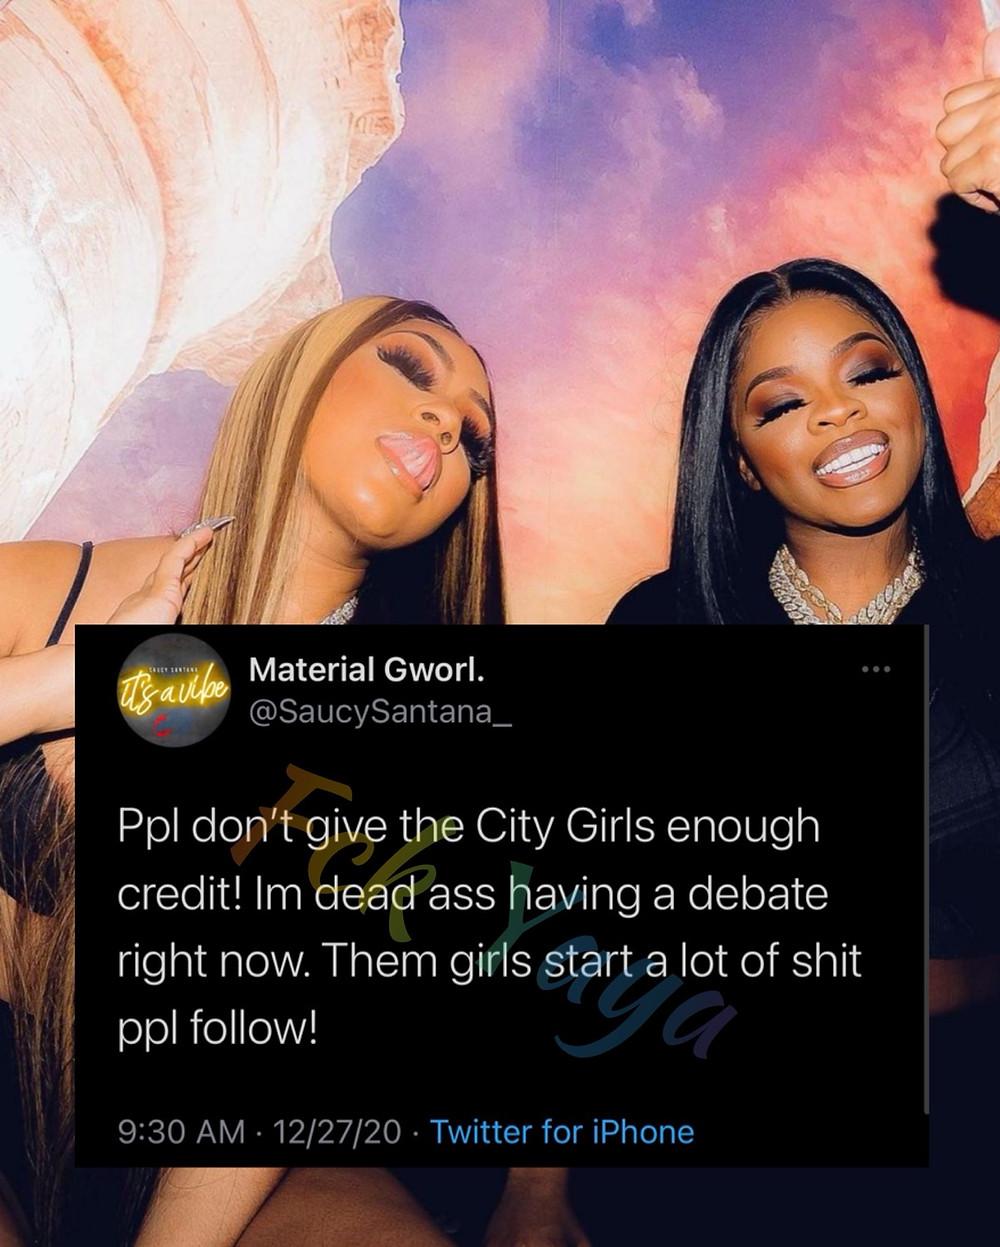 Saucy Santana says the City Girls Don't Get enough credit